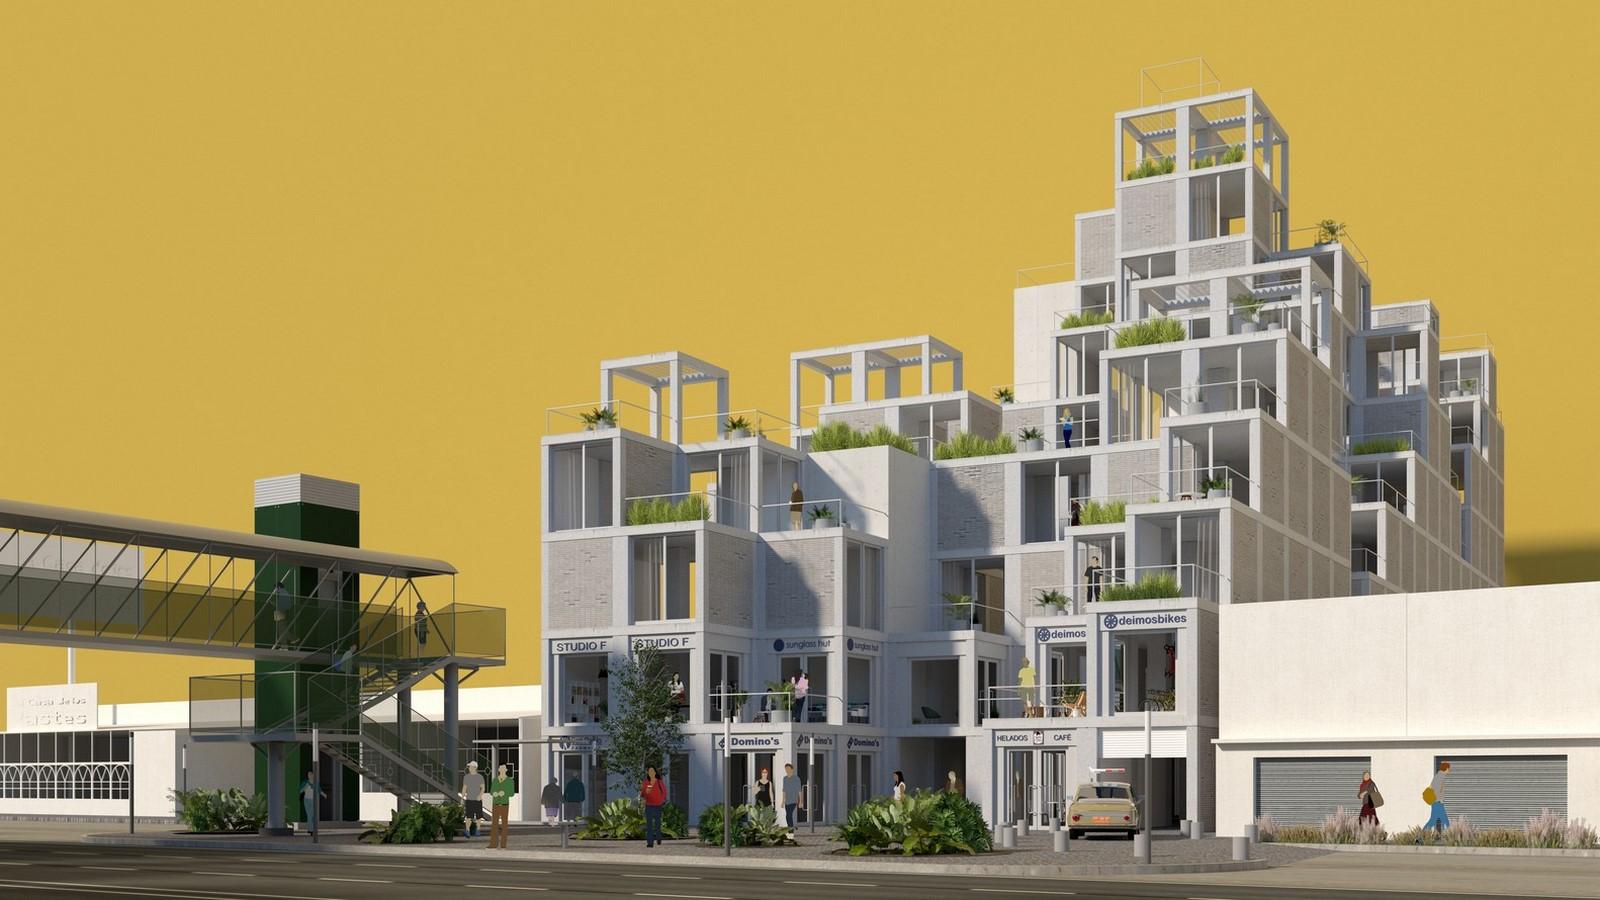 Architecture, an art of skills - Sheet5